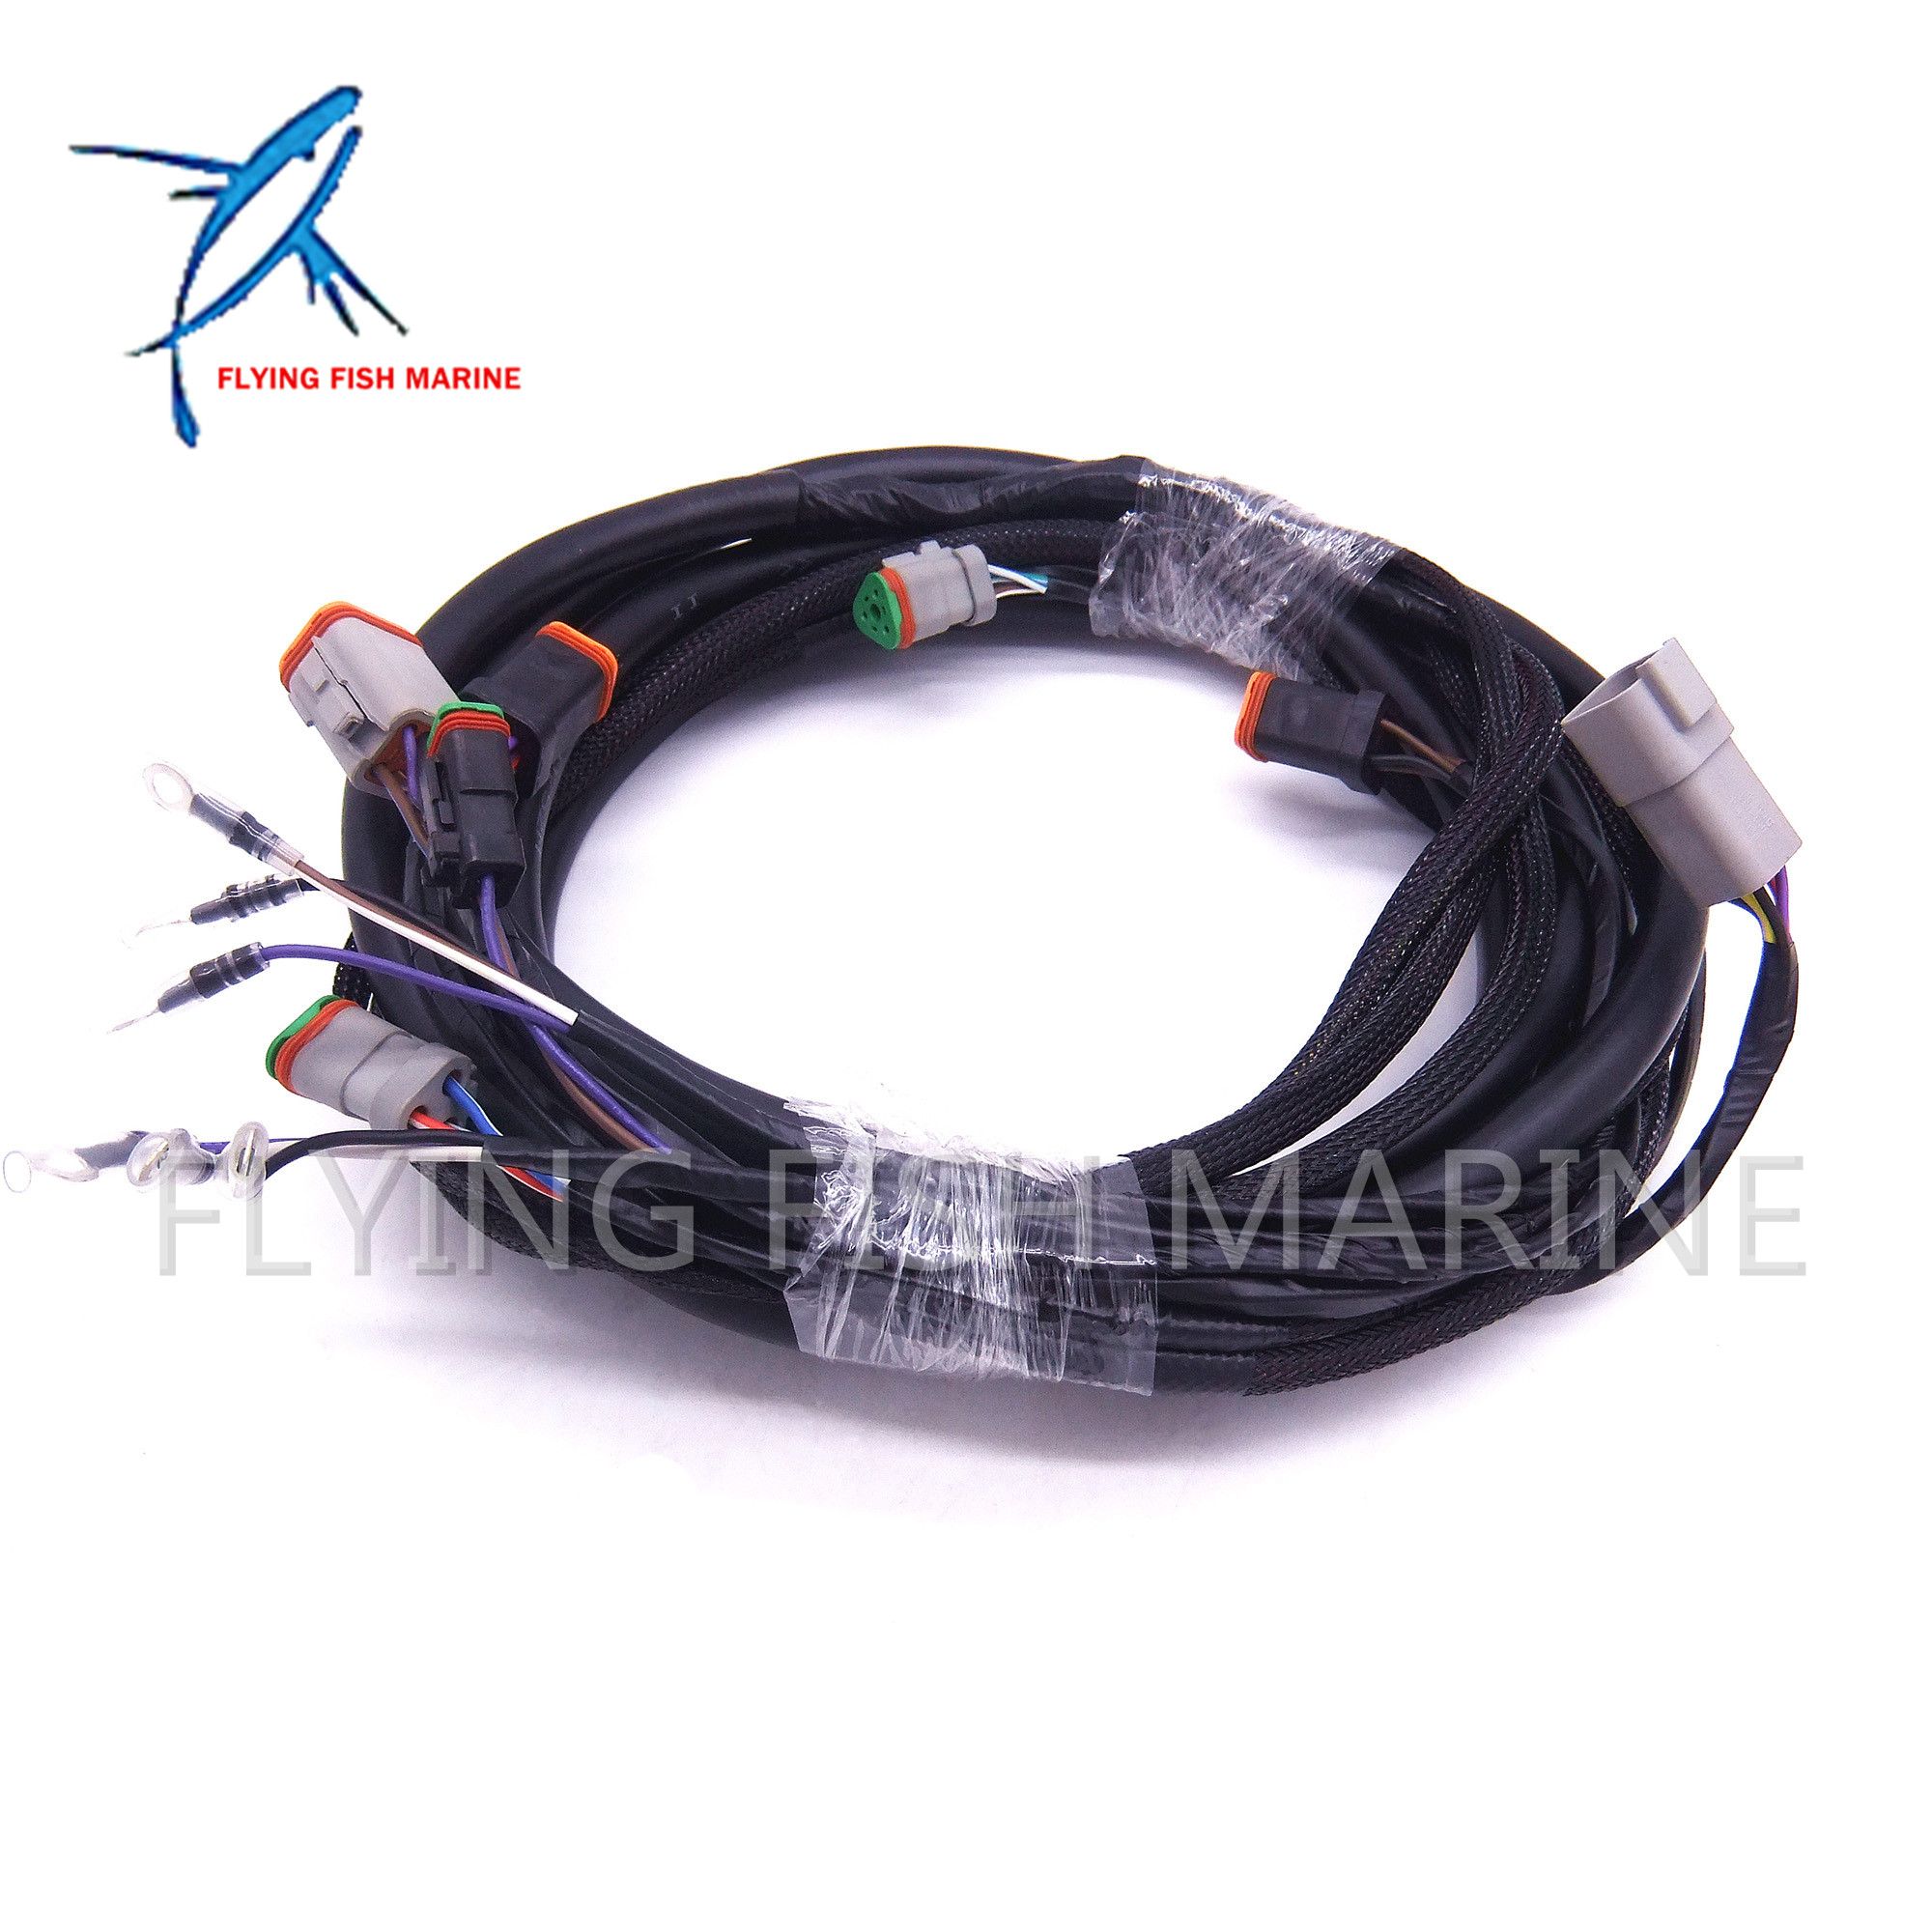 medium resolution of evinrude wire harness wiring diagram centre internal engine wiring harness evinrude johnson omc 1969 55 hp new